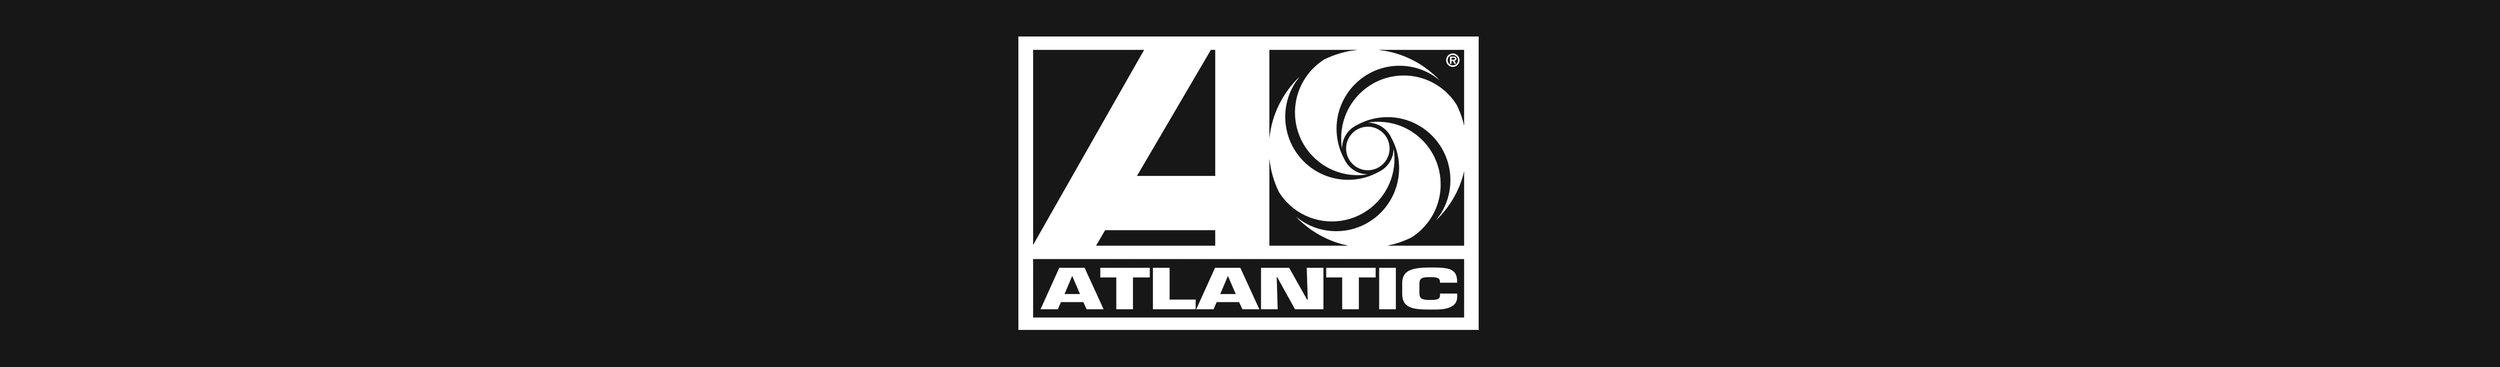 IntWebsite_Clients_White_AtlanticRecords.jpg